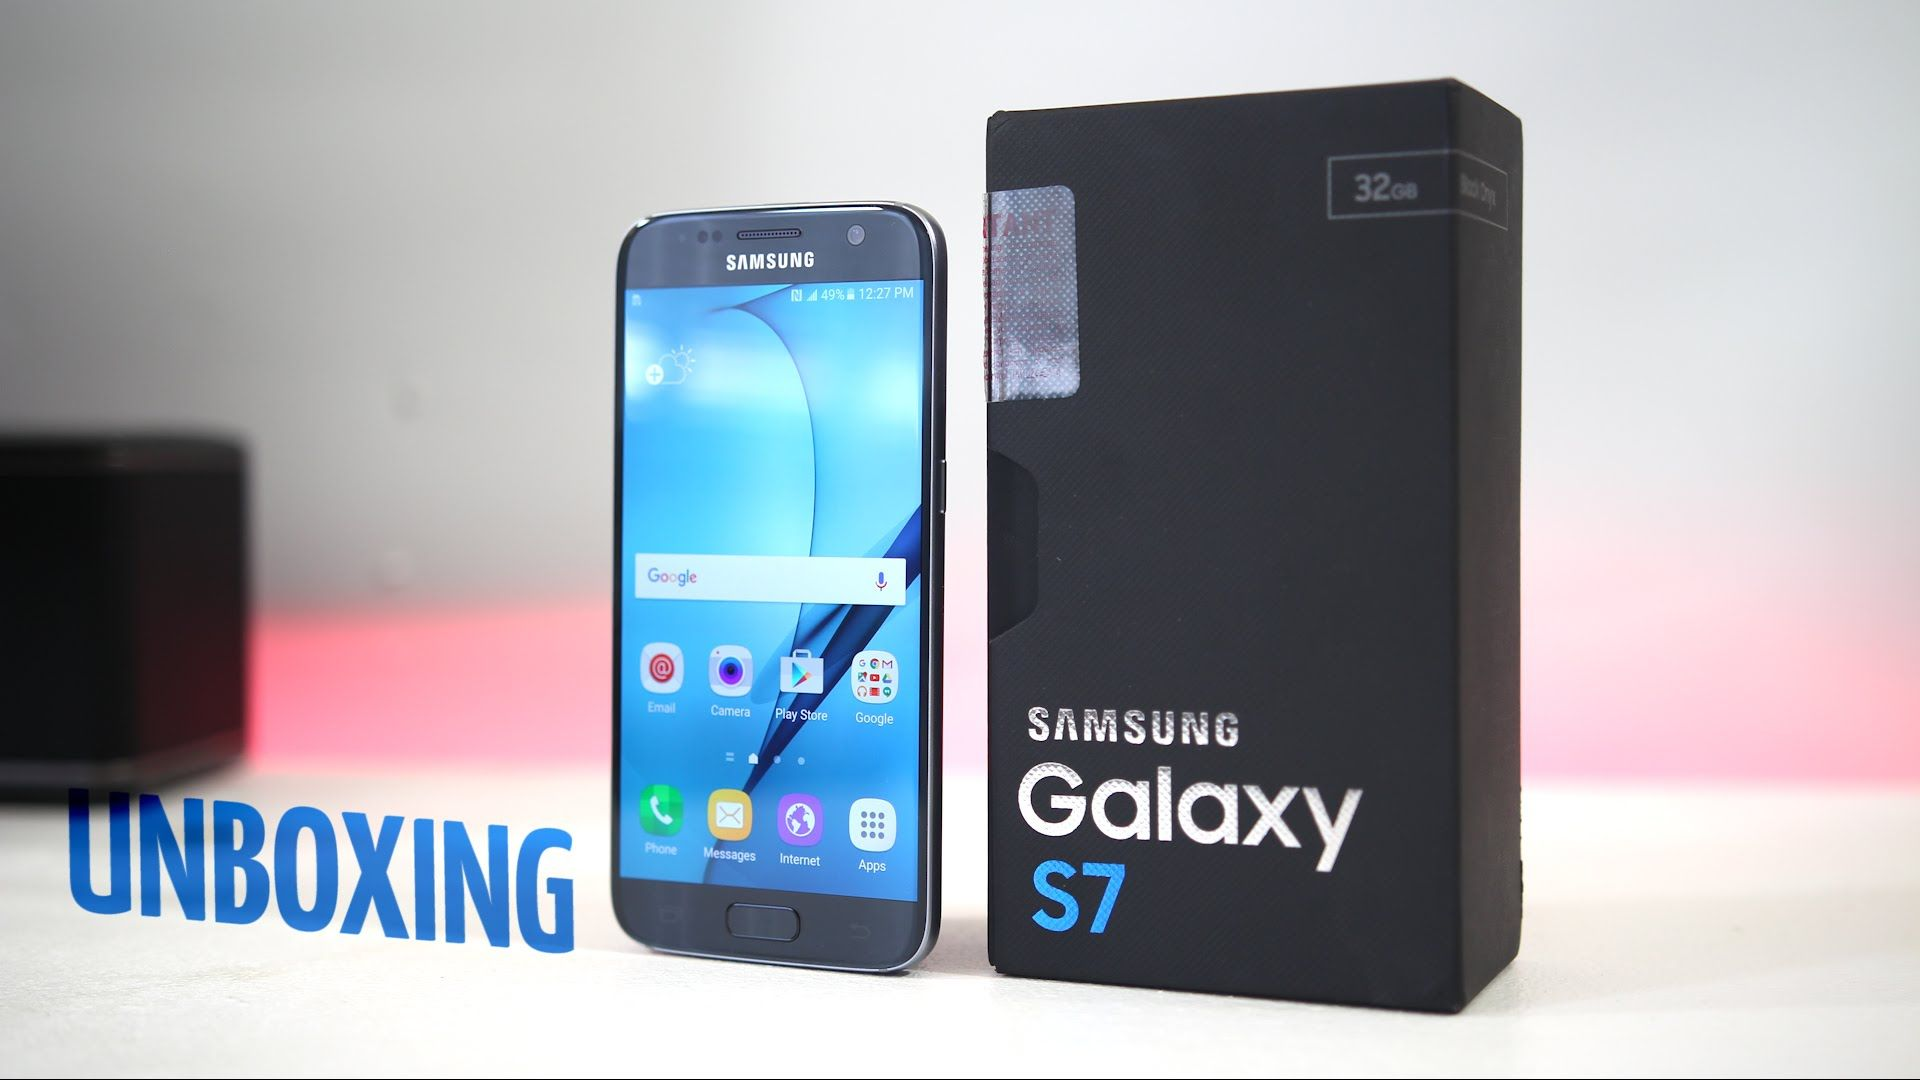 New Replica Clone Unlocked Sealed 1 1 Samsung Galaxy S7 Android 7 1 Snapdragon 835 4gb Ram 32gb 64gb Rom 4g Lte Unboxin Samsung Galaxy Samsung Galaxy S7 Galaxy